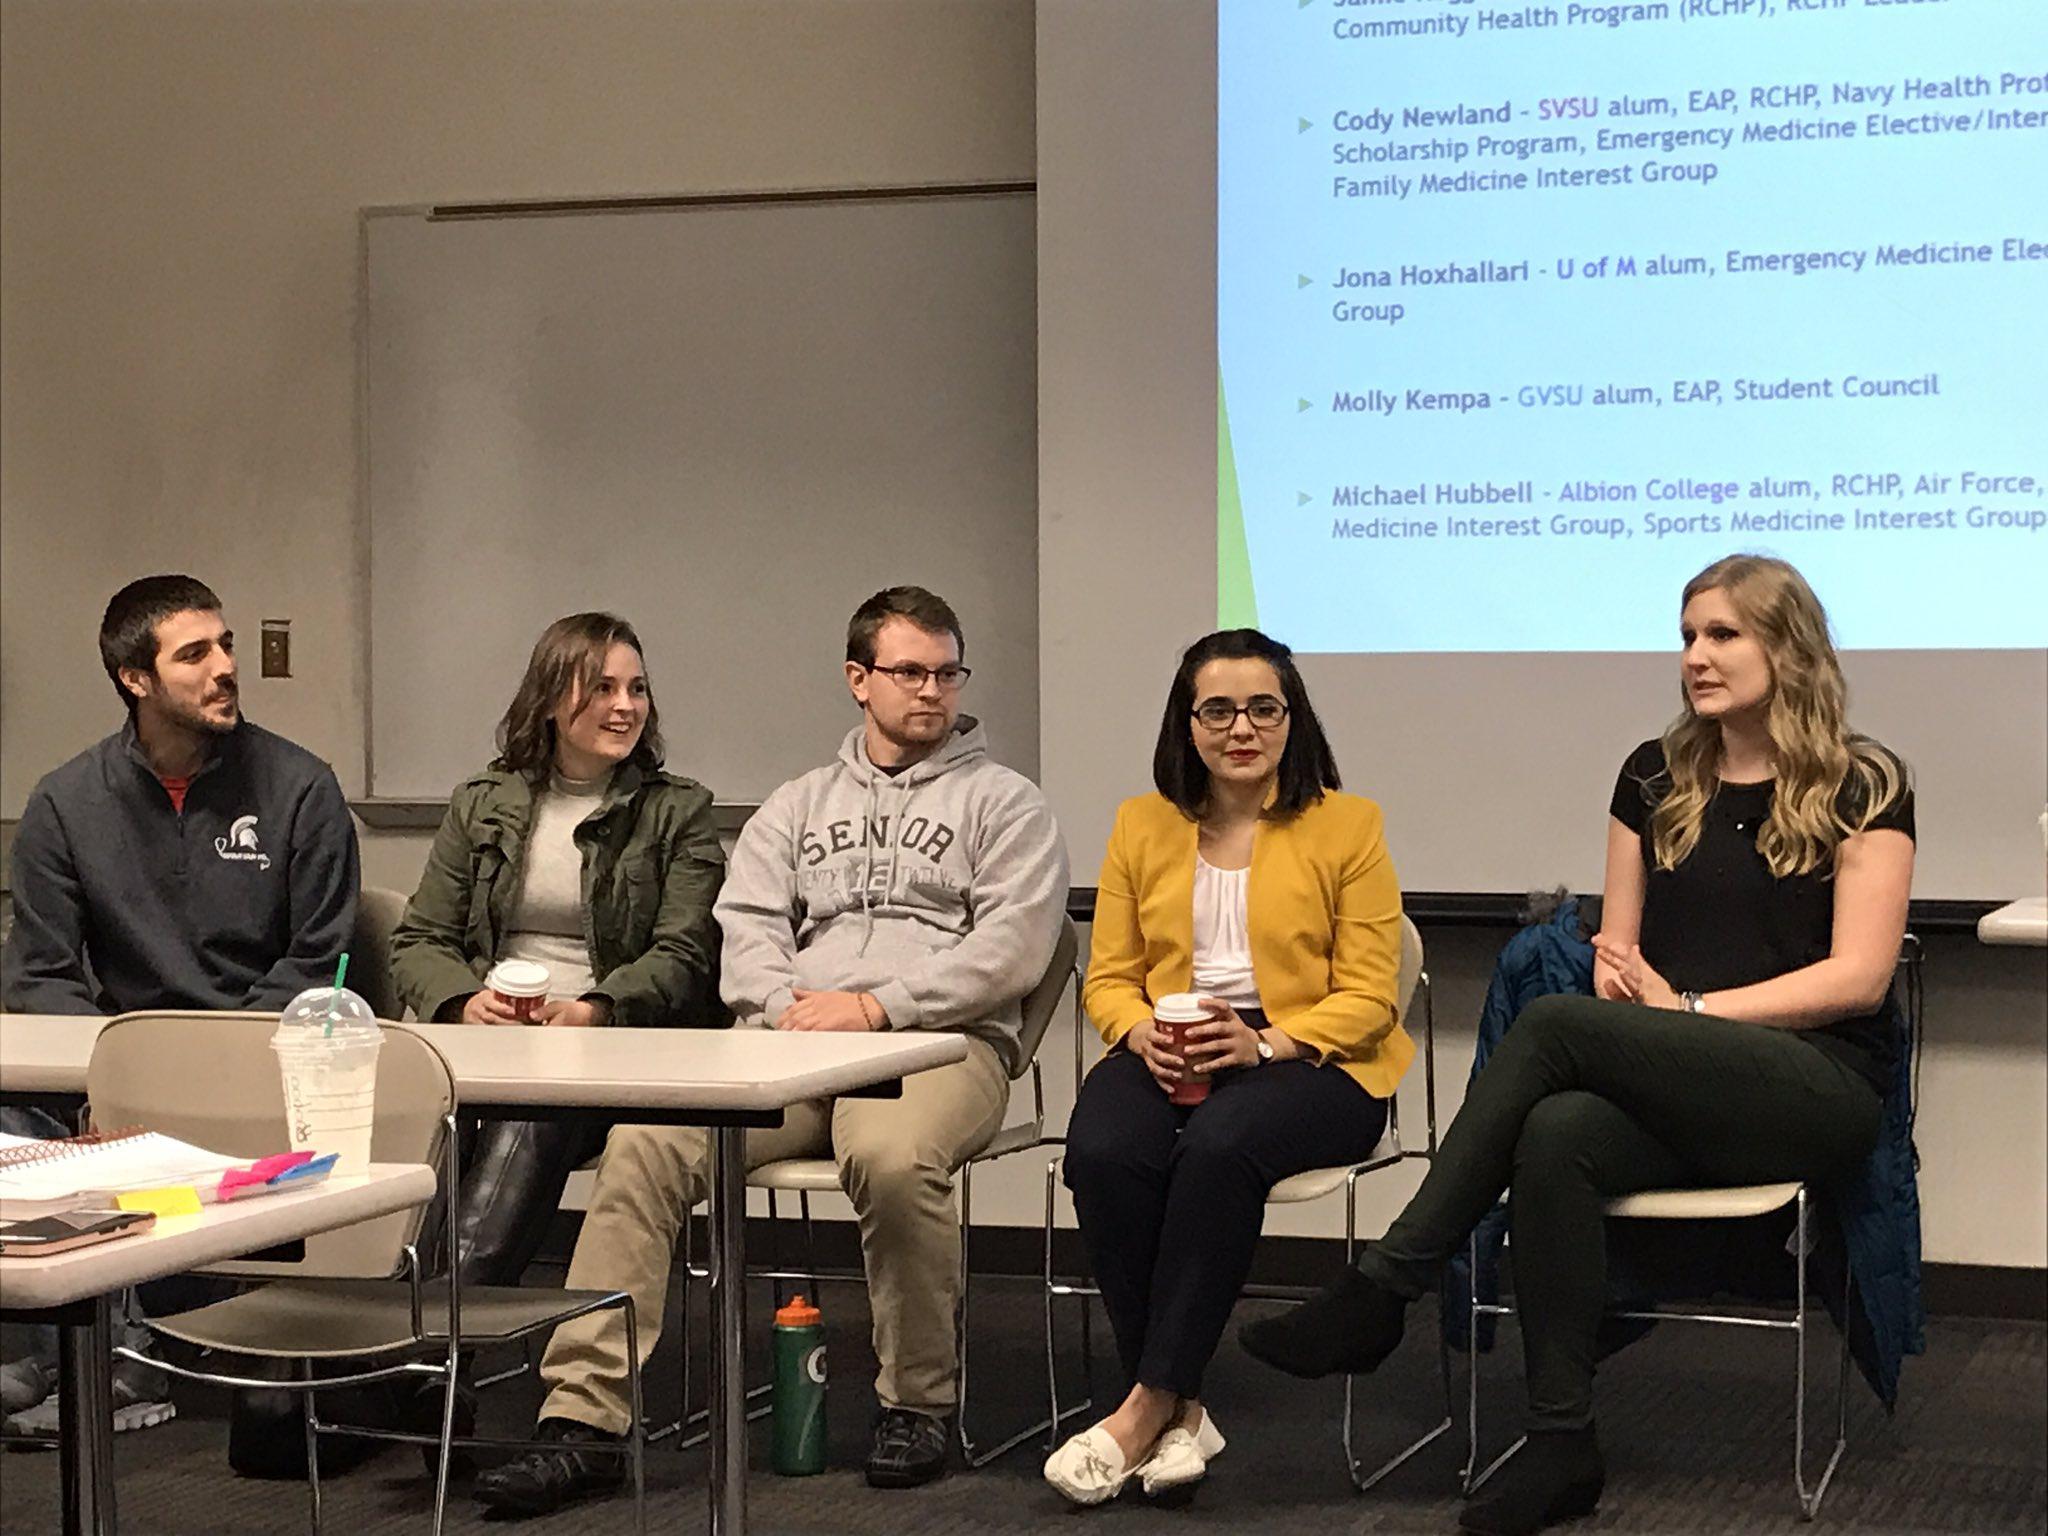 Welcome to #SVSU @MSUMD M1 students sharing about NEW curriculum. Welcome back to Cody Newland & Jamie Roggenbuck, SVSU alums! #WeCardinal https://t.co/4oNZvNR7my